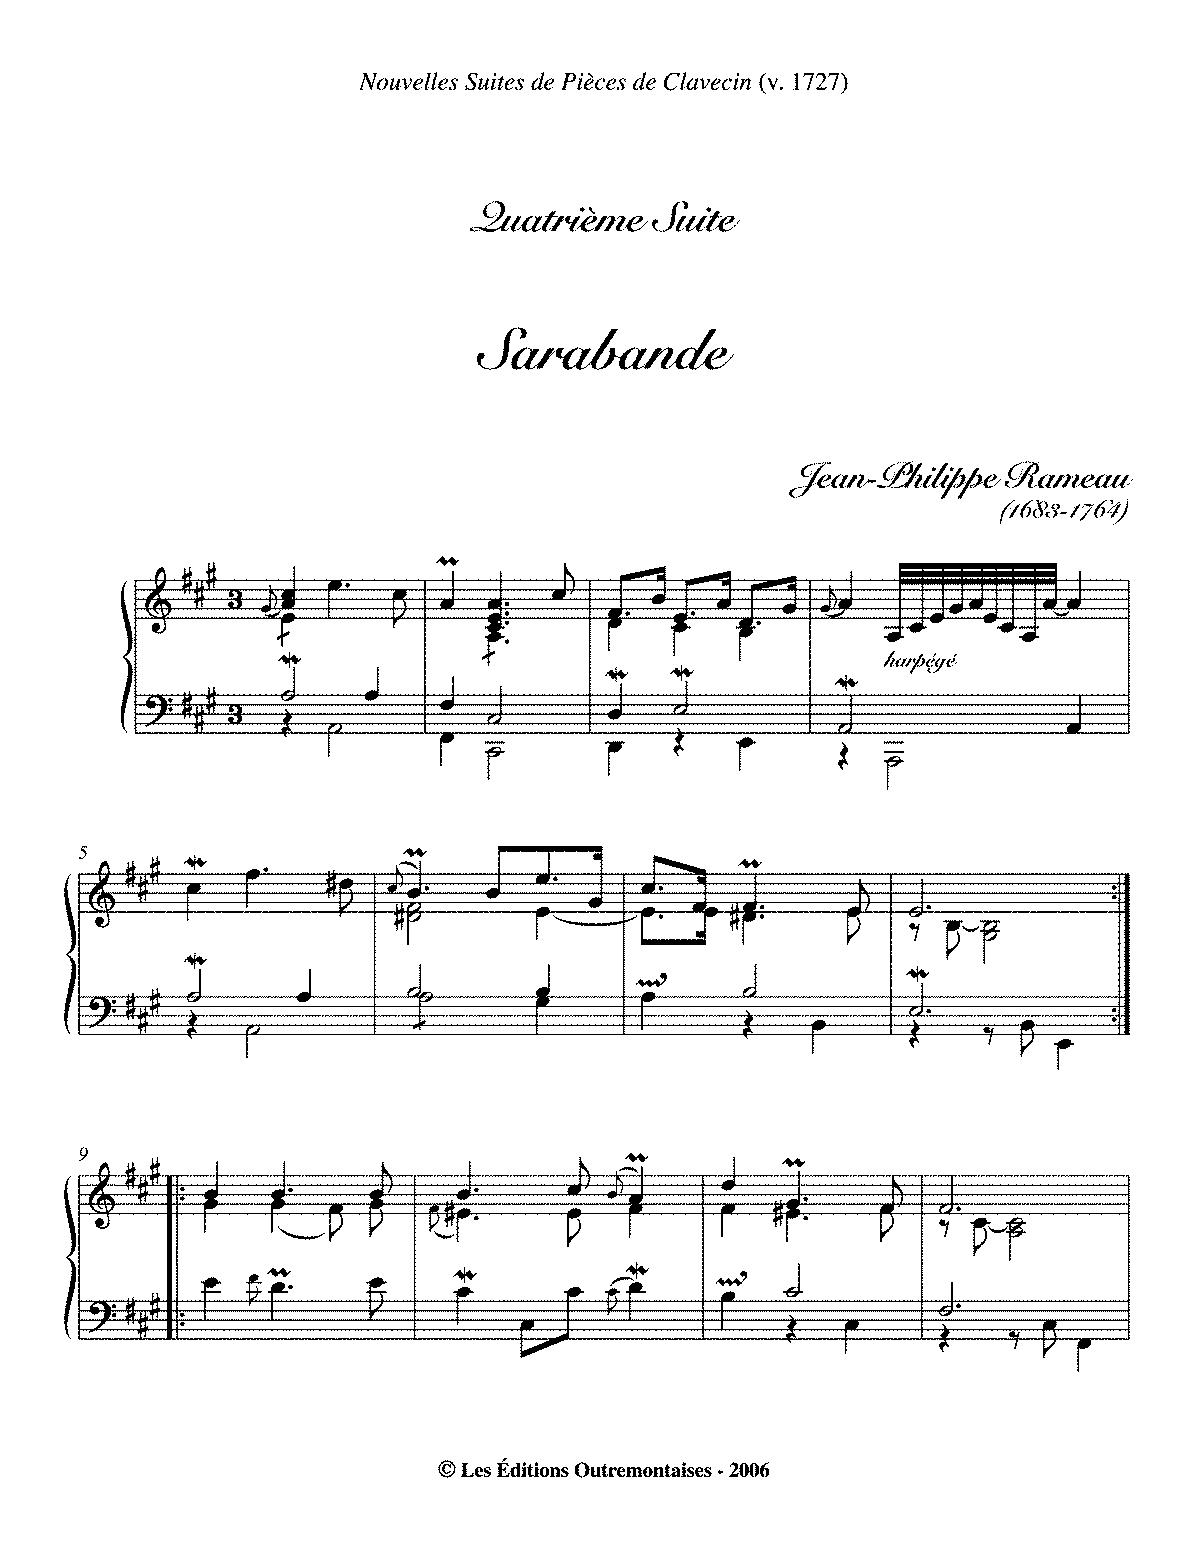 canon de pachelbel partition piano pdf